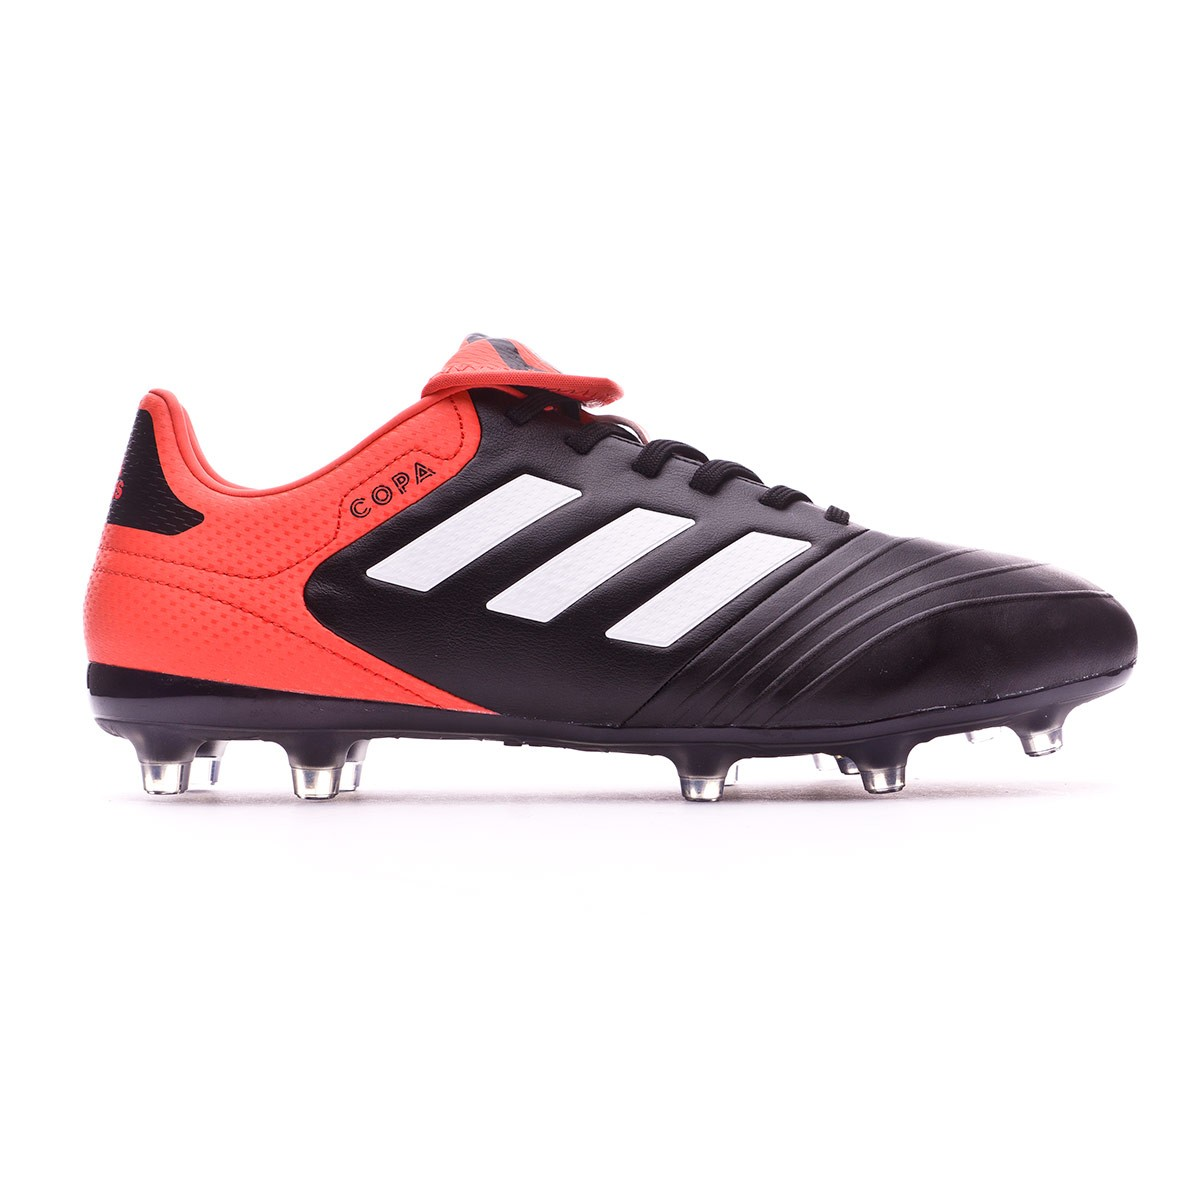 bada97aae Football Boots adidas Copa 18.3 FG Core black-White-Real coral - Football  store Fútbol Emotion